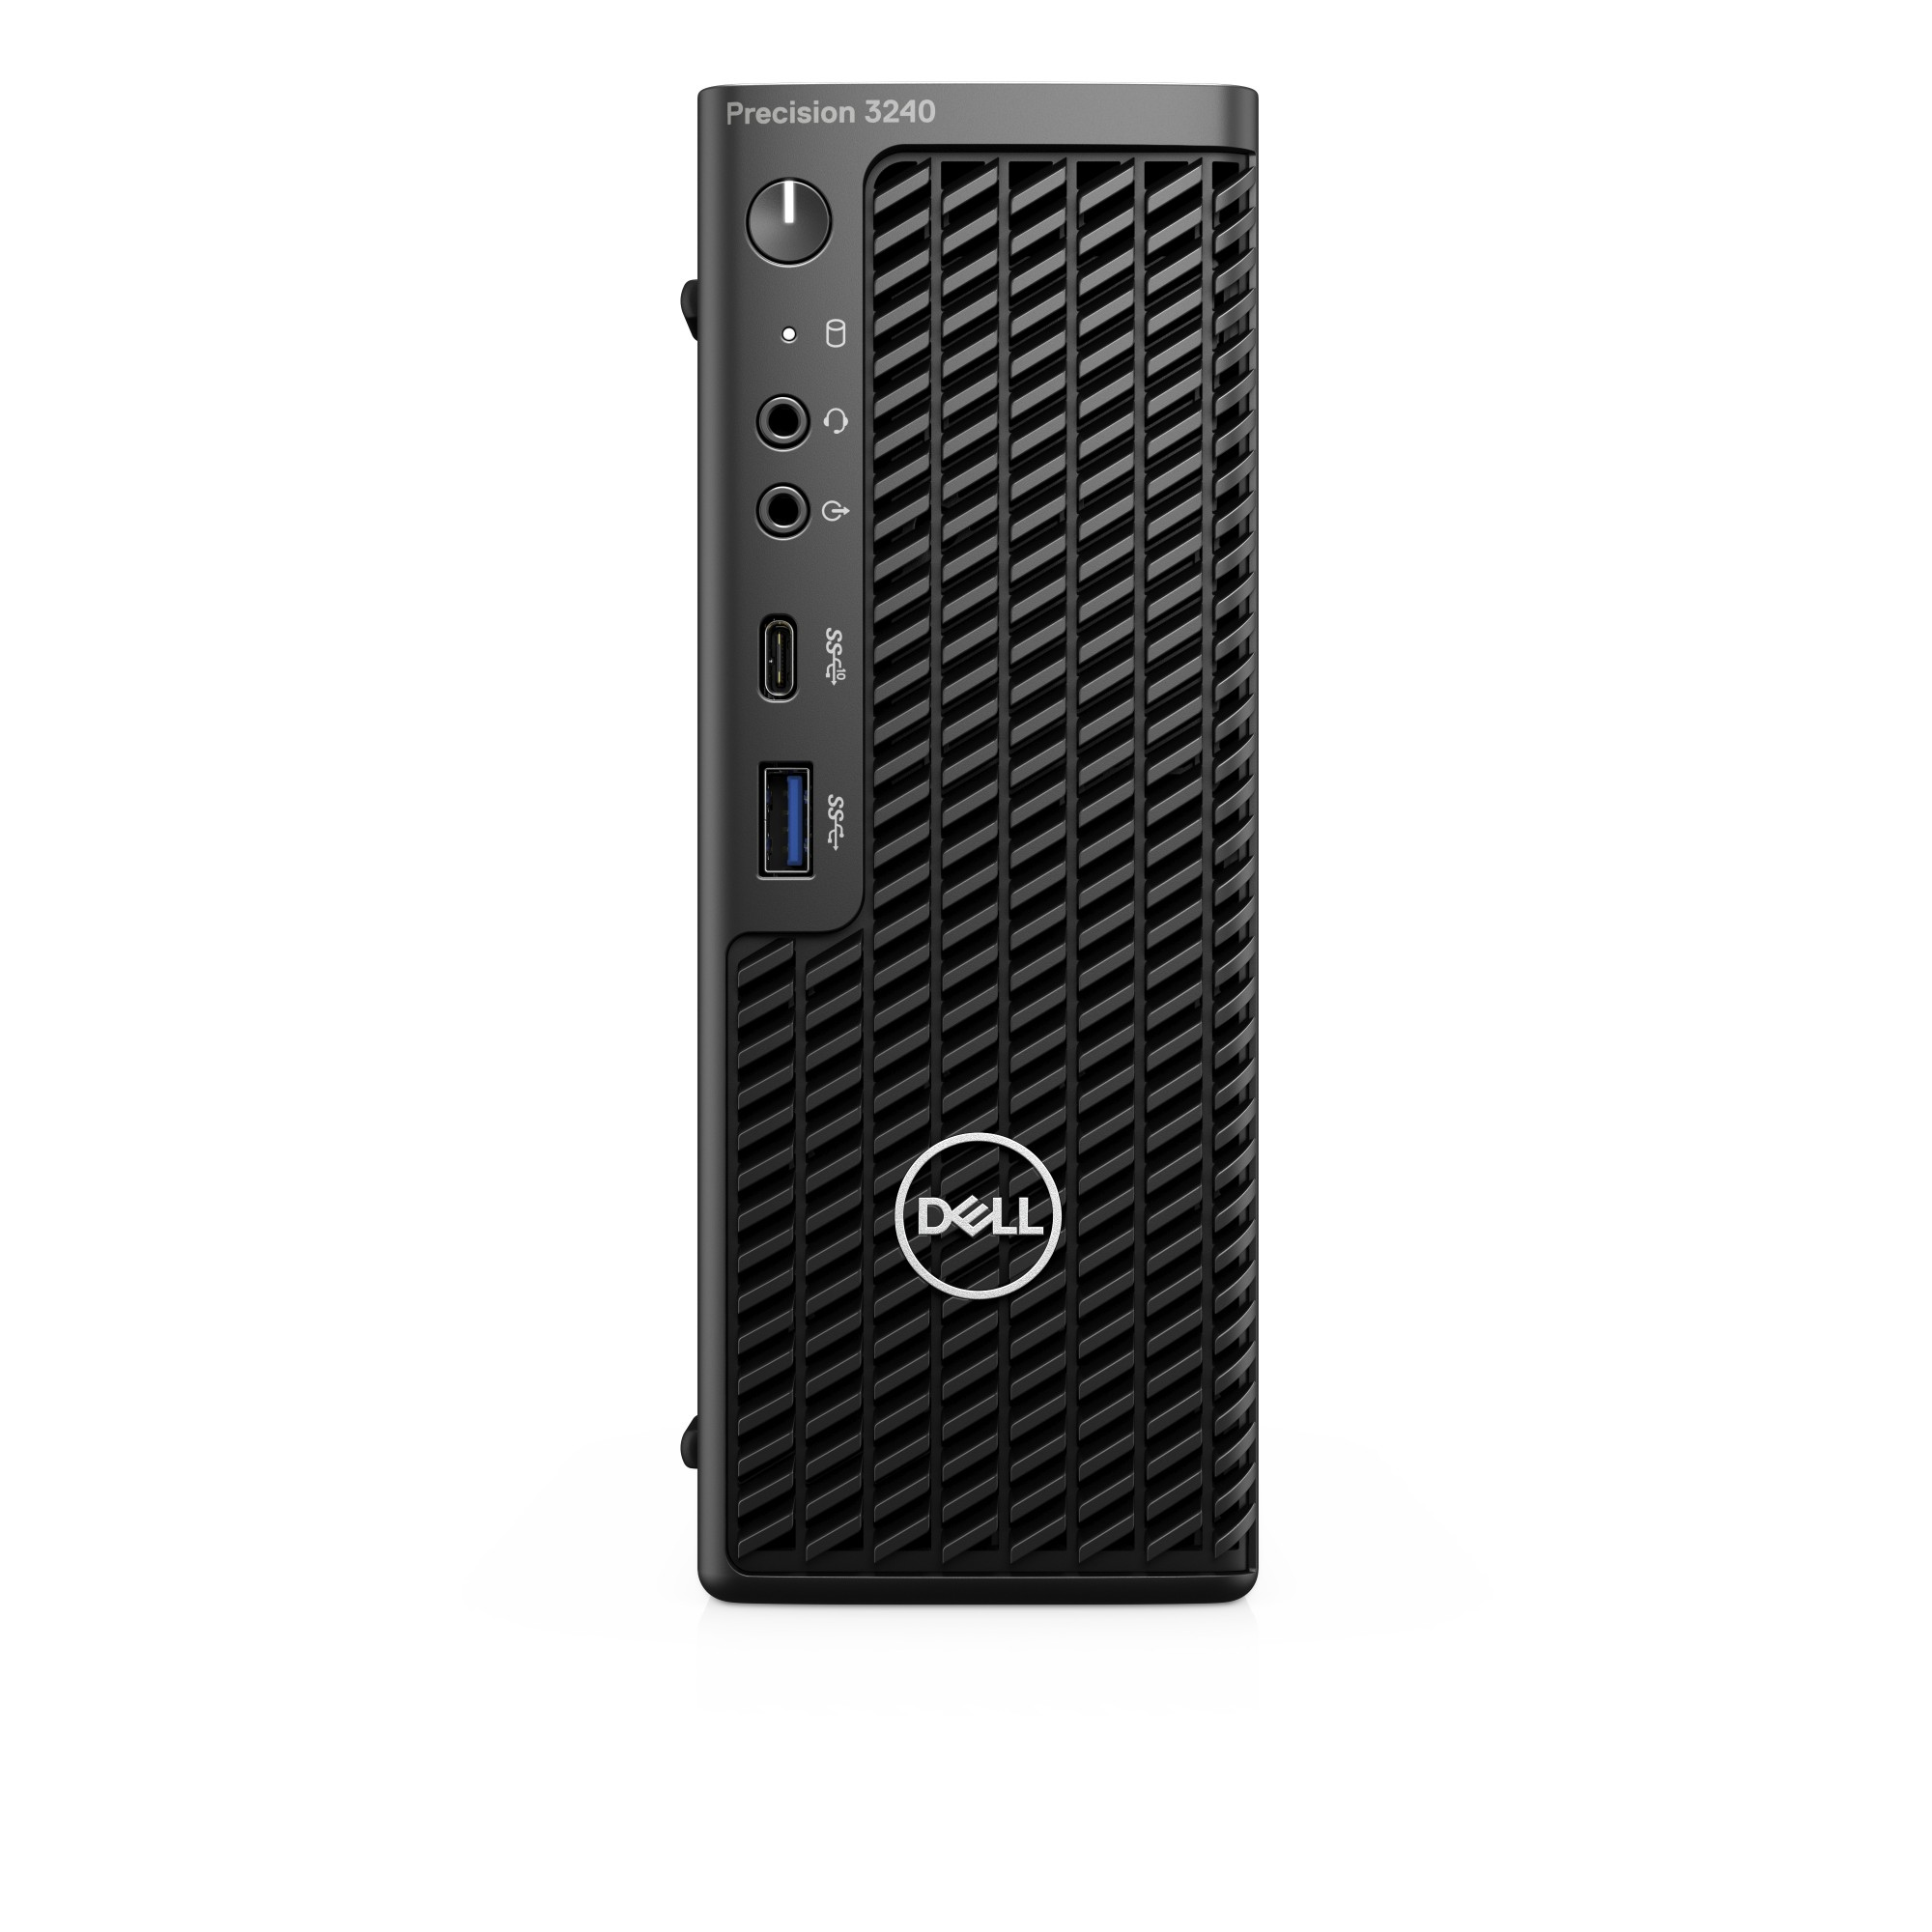 DELL Precision 3240 10th gen Intel® Core™ i7 i7-10700 16 GB DDR4-SDRAM 512 GB SSD CFF Black Workstation Windows 10 Pro